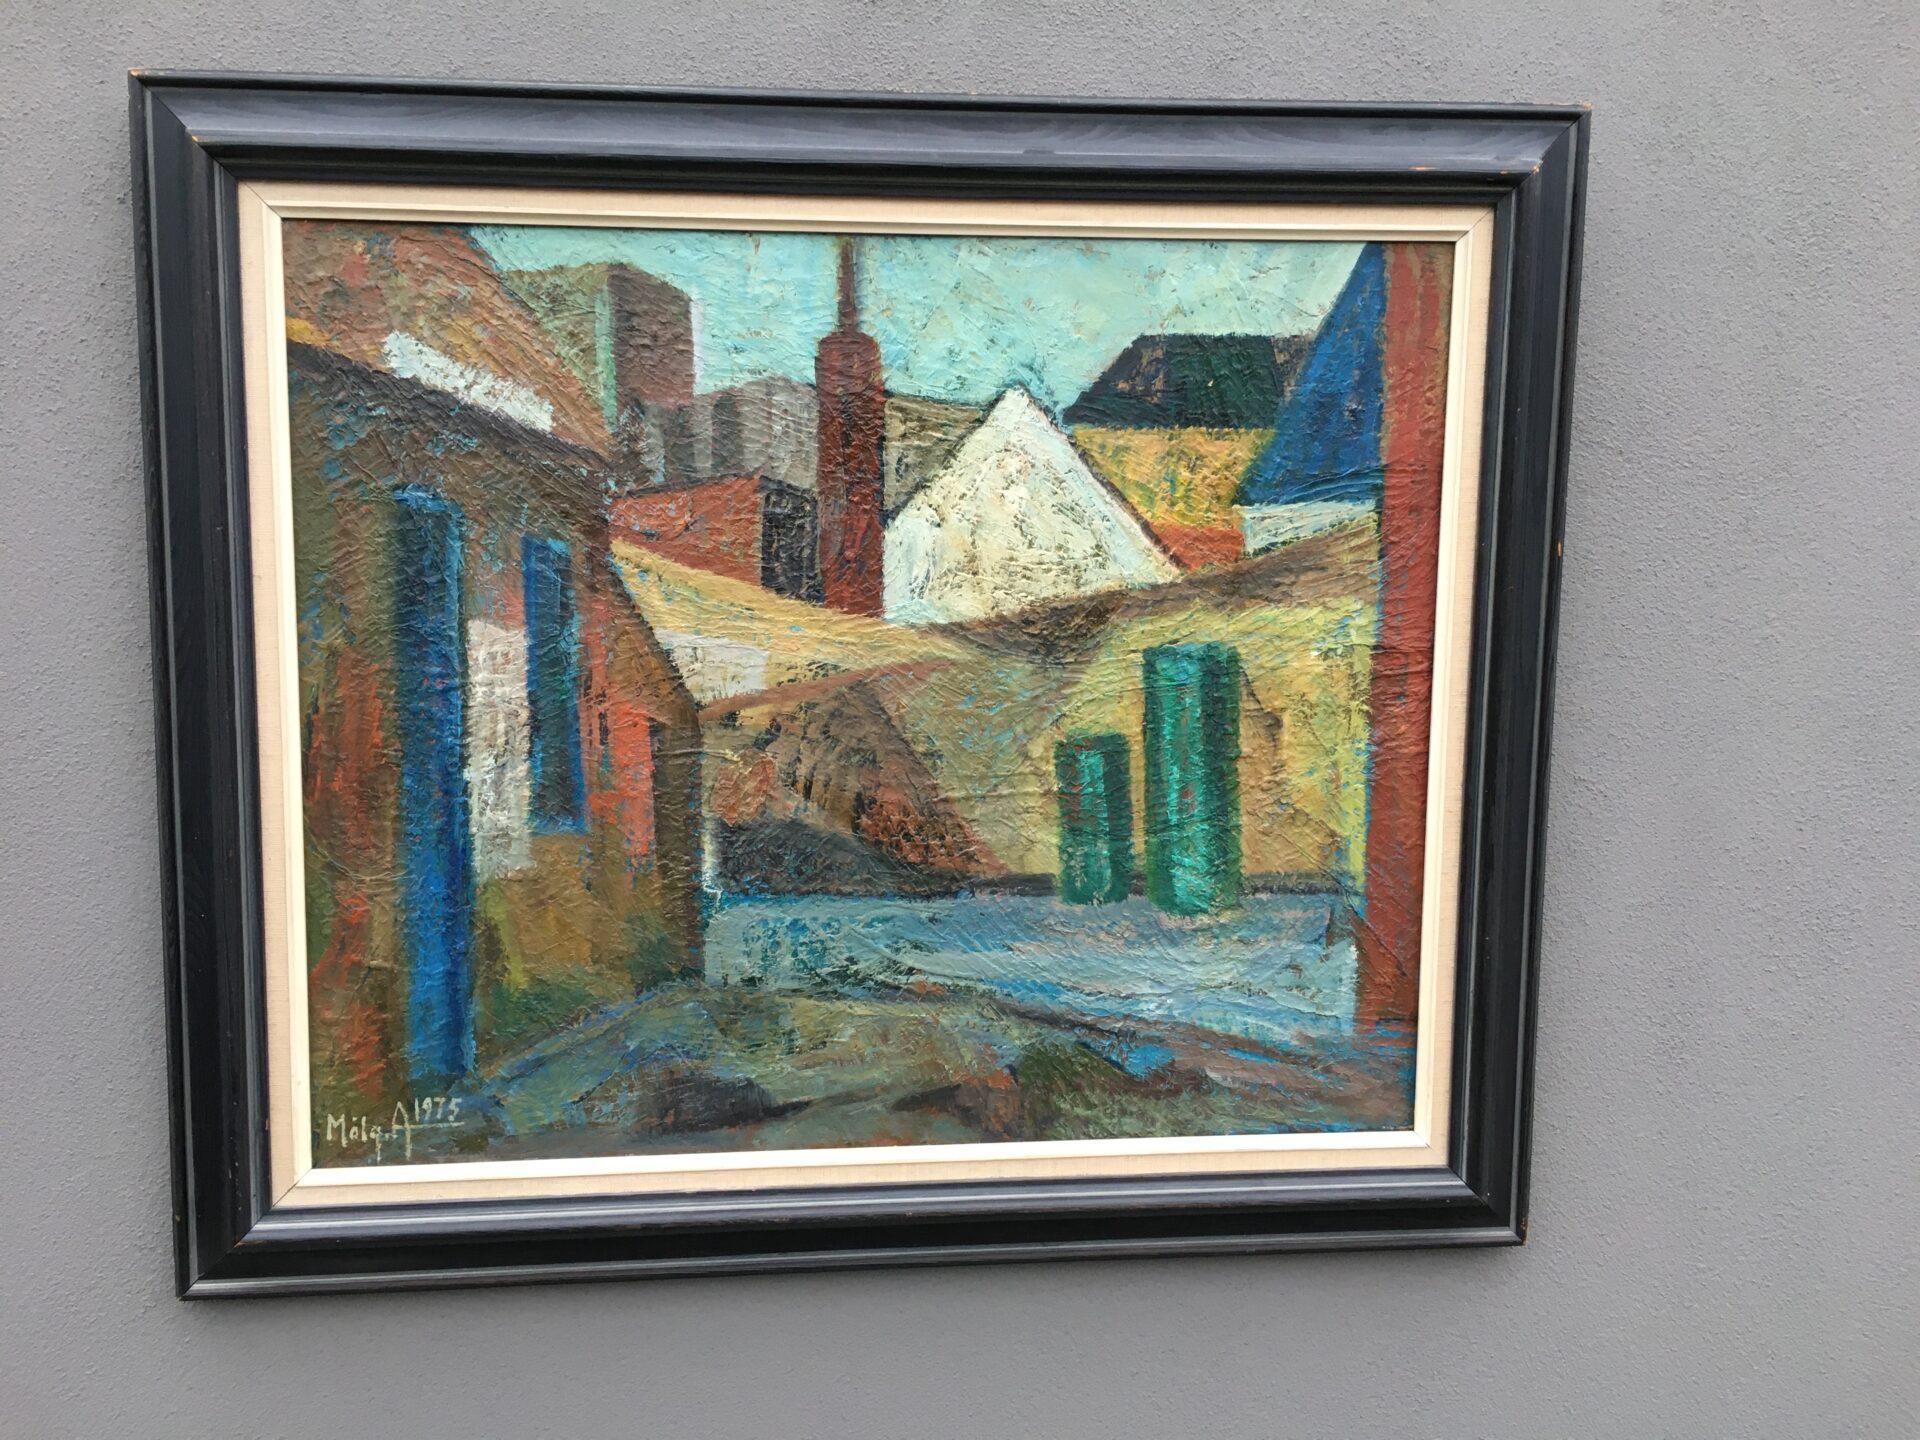 Maleri sign, Mølgaard Andersen 75, rammemål 73x87 cm, pris 700kr